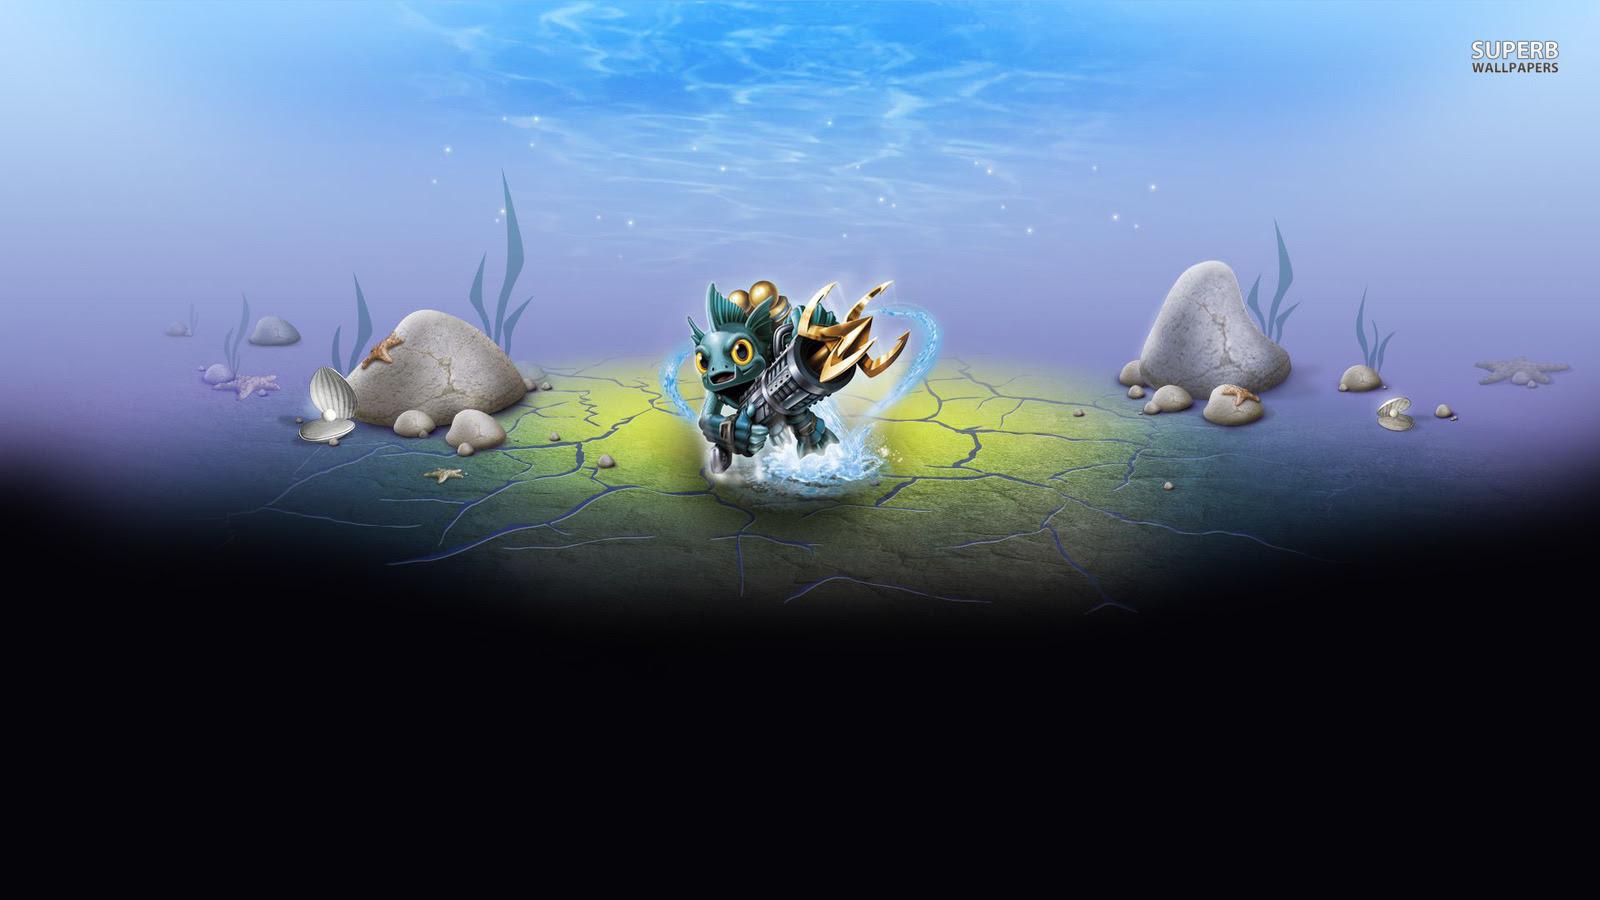 Gill Grunt Spyro The Dragon Fondo De Pantalla 38700656 Fanpop